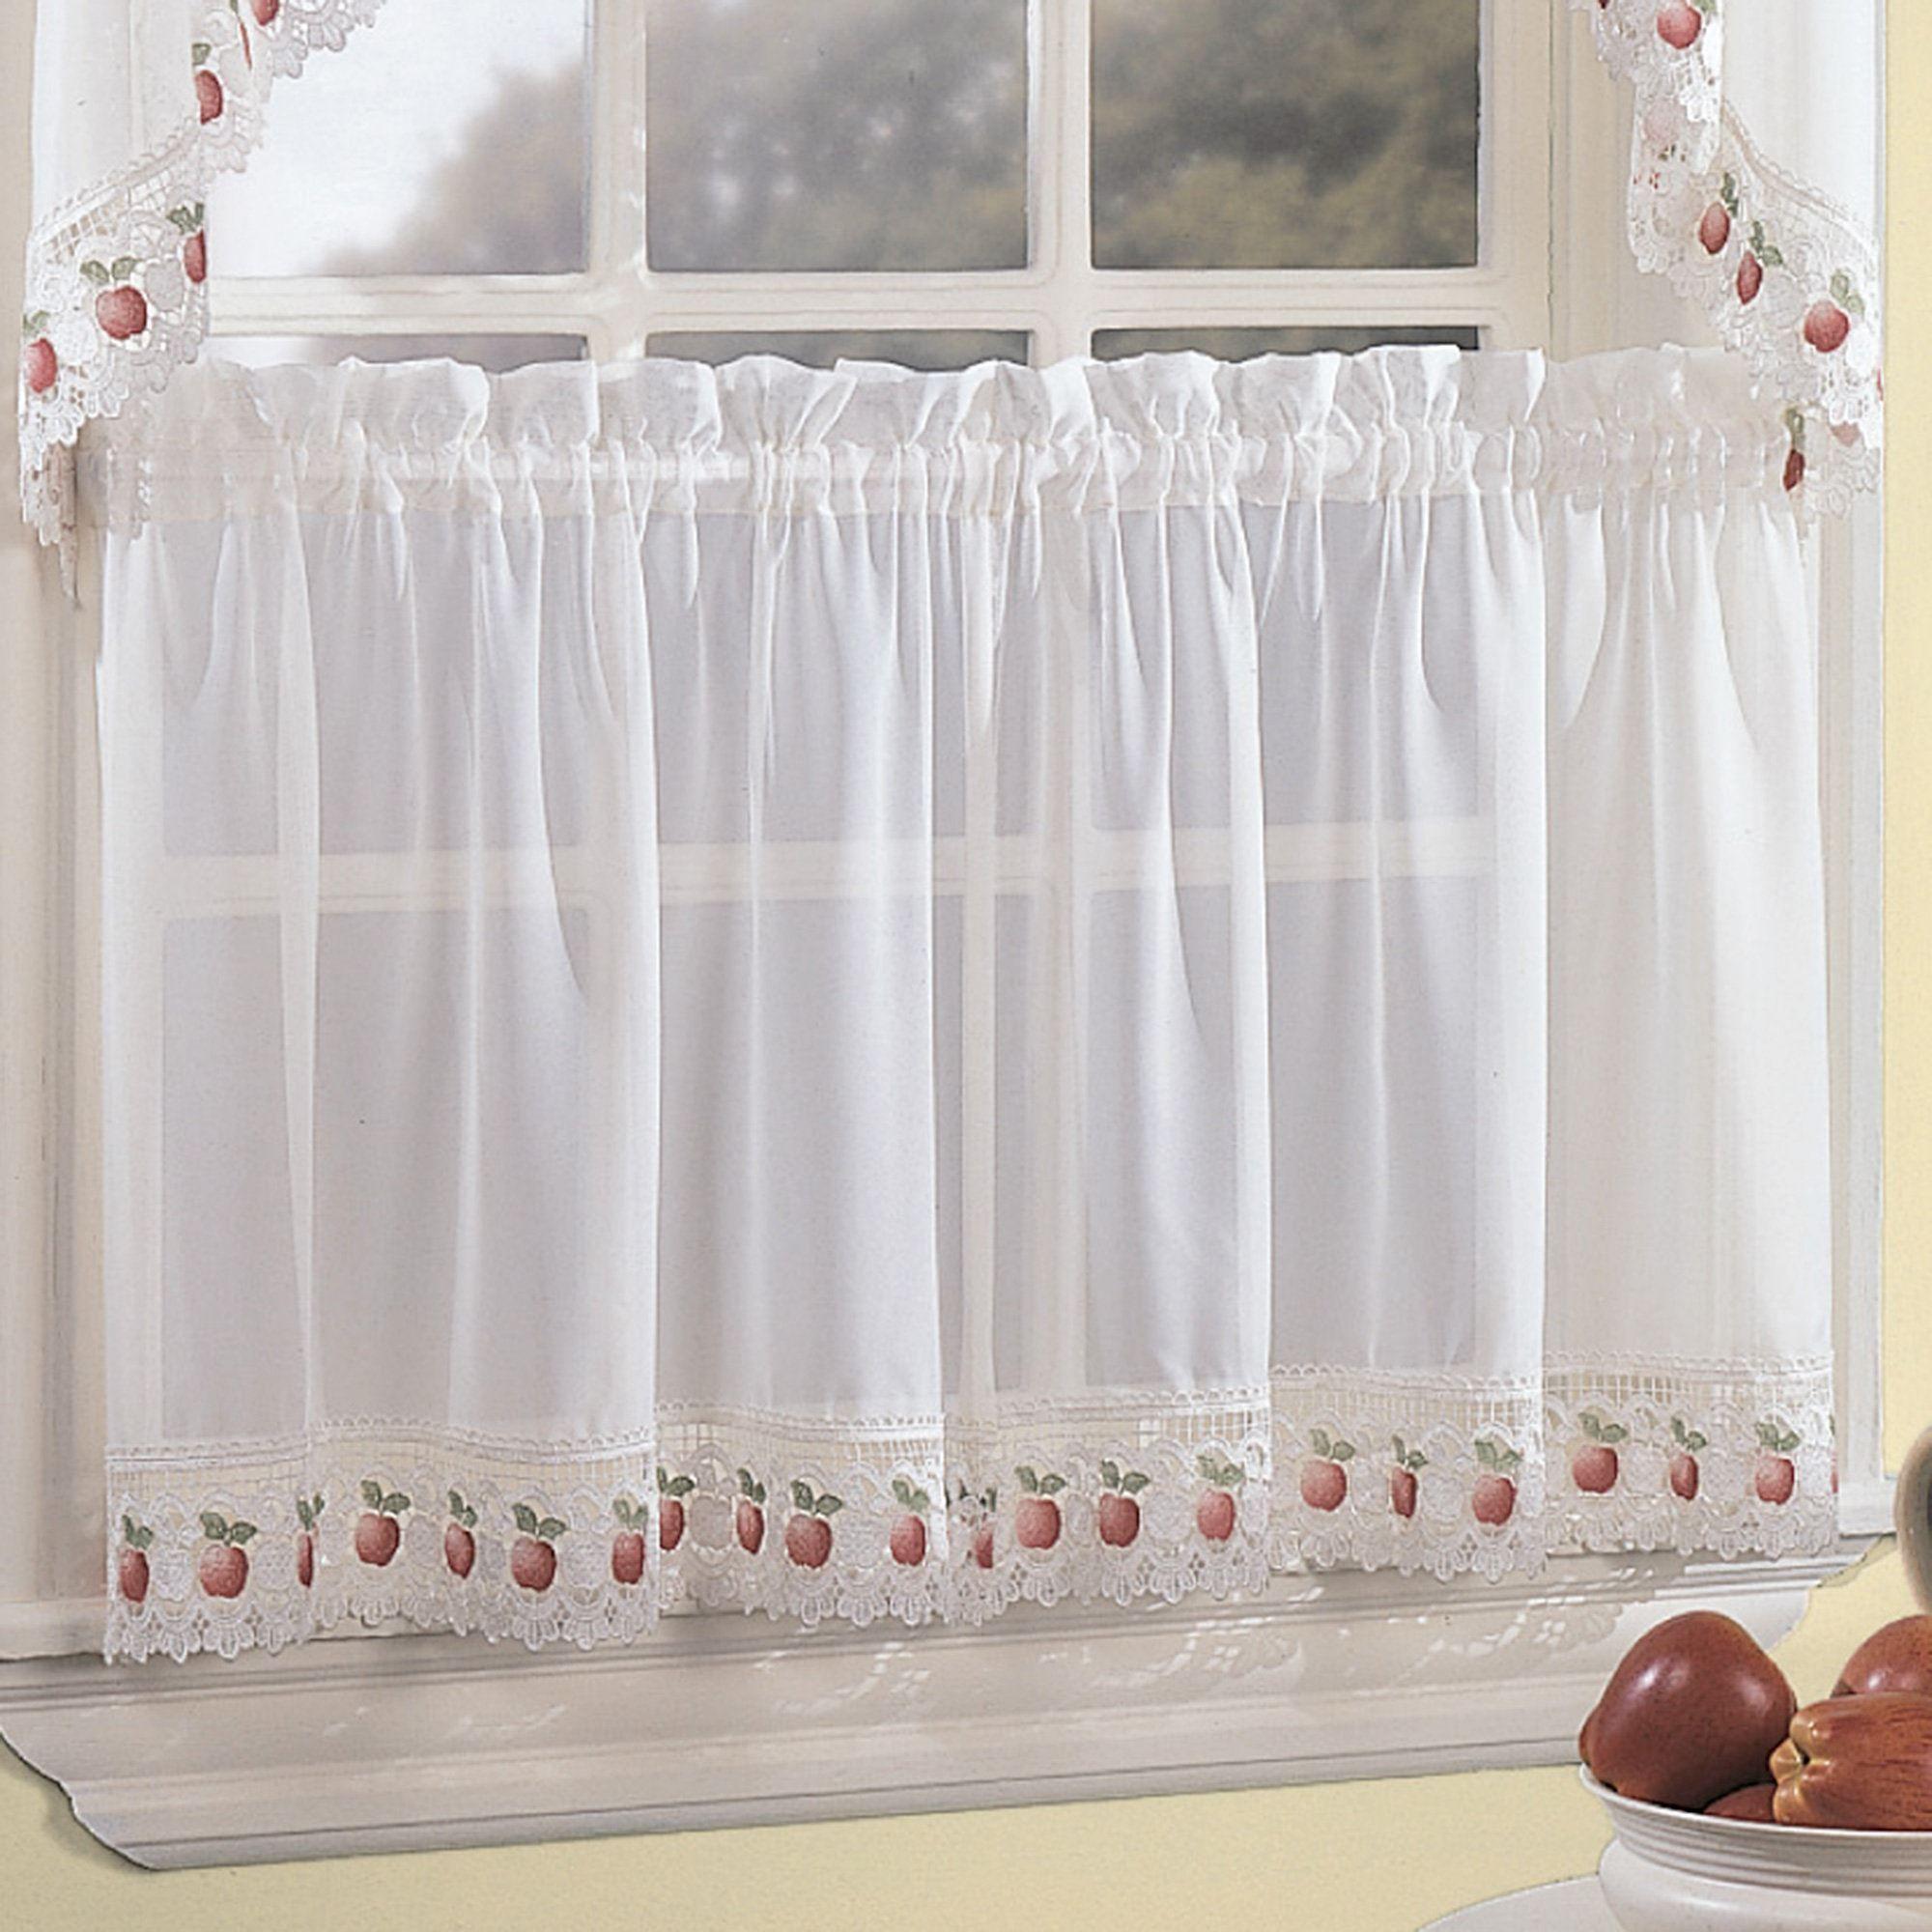 Apple Orchard Sheer Kitchen Tier Window Treatment